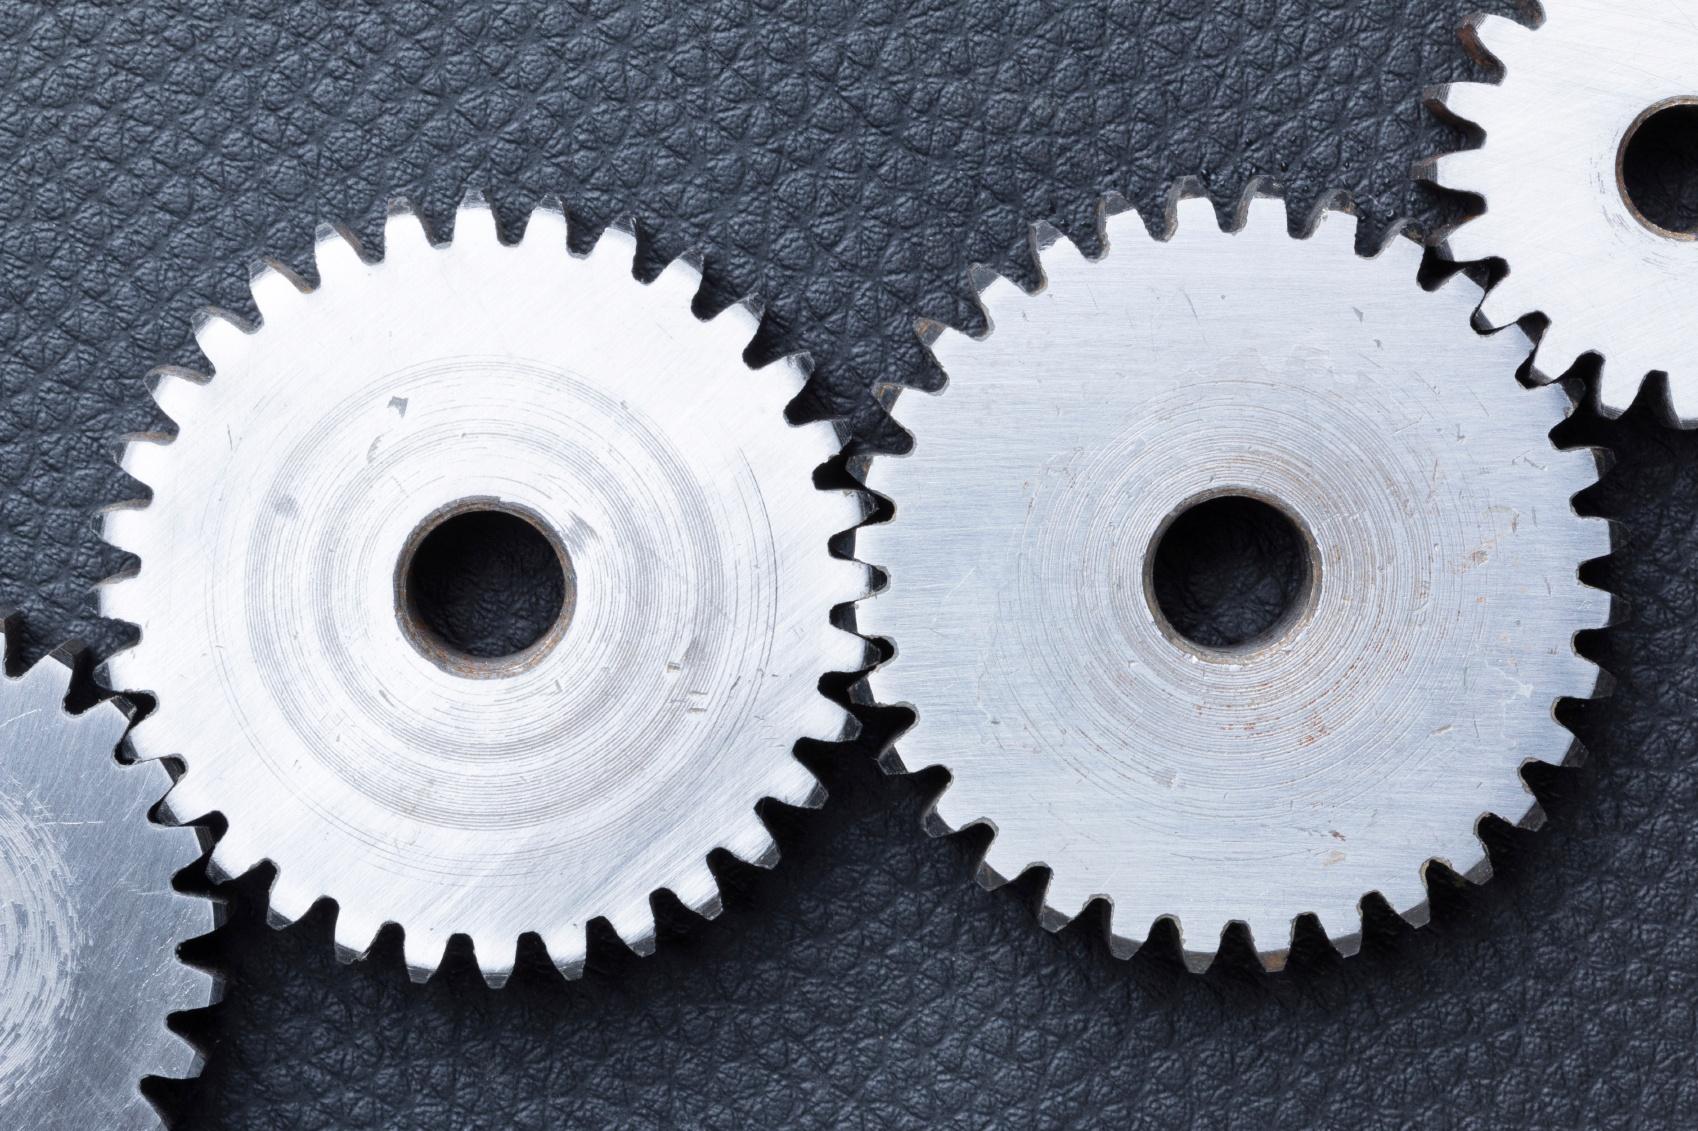 metal gears working